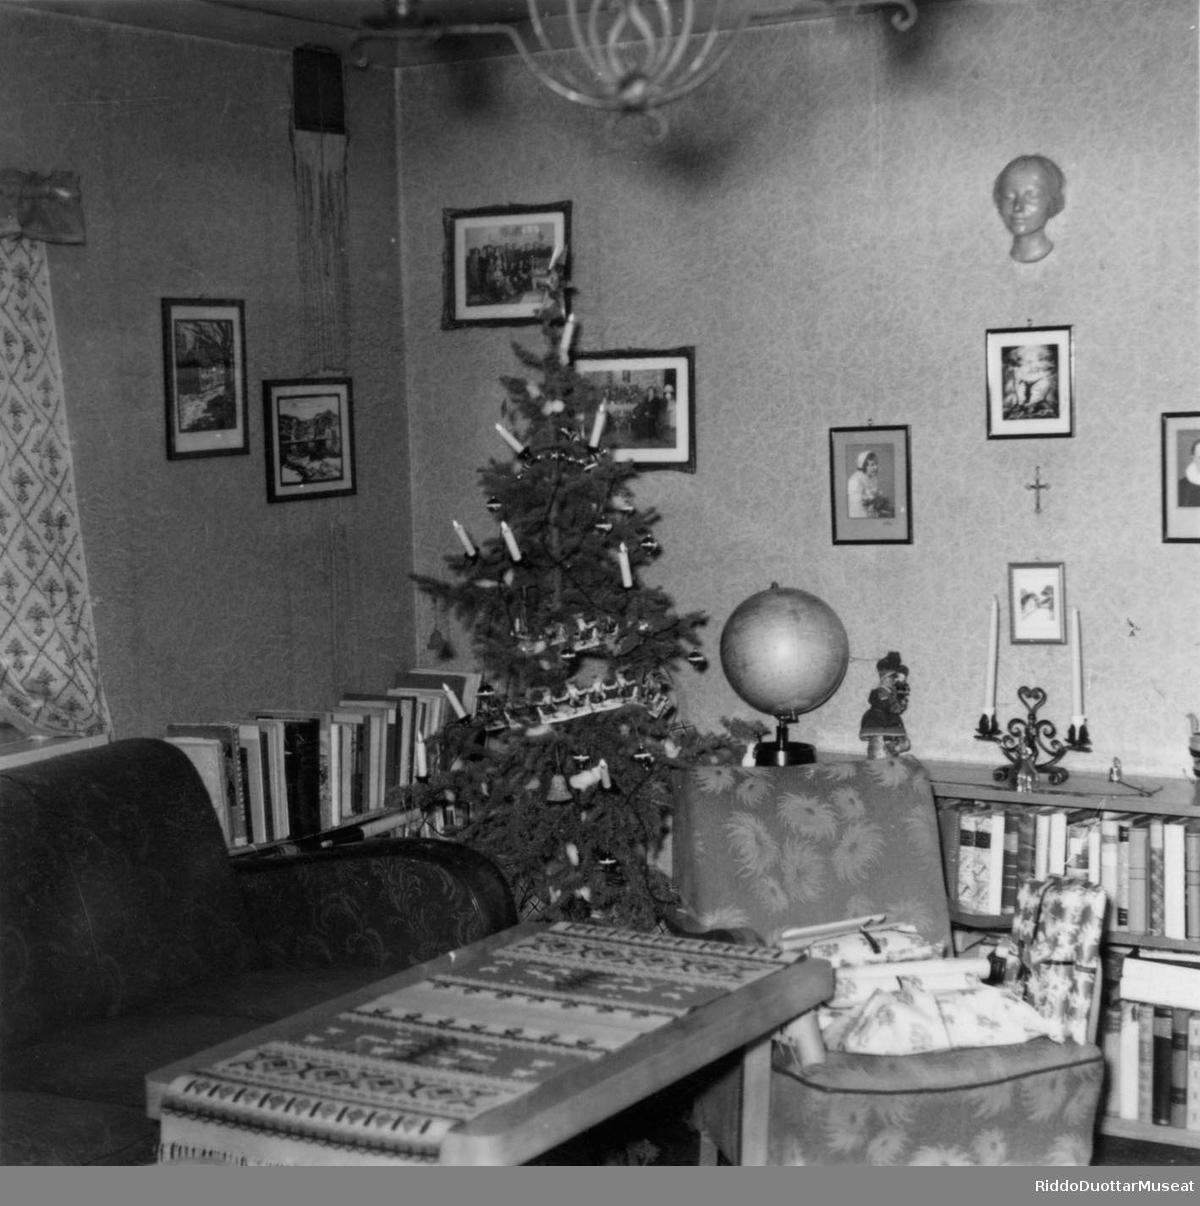 Stohpu, juovlamuorra duogábealde. Stue, med juletre i bakgrunnen.